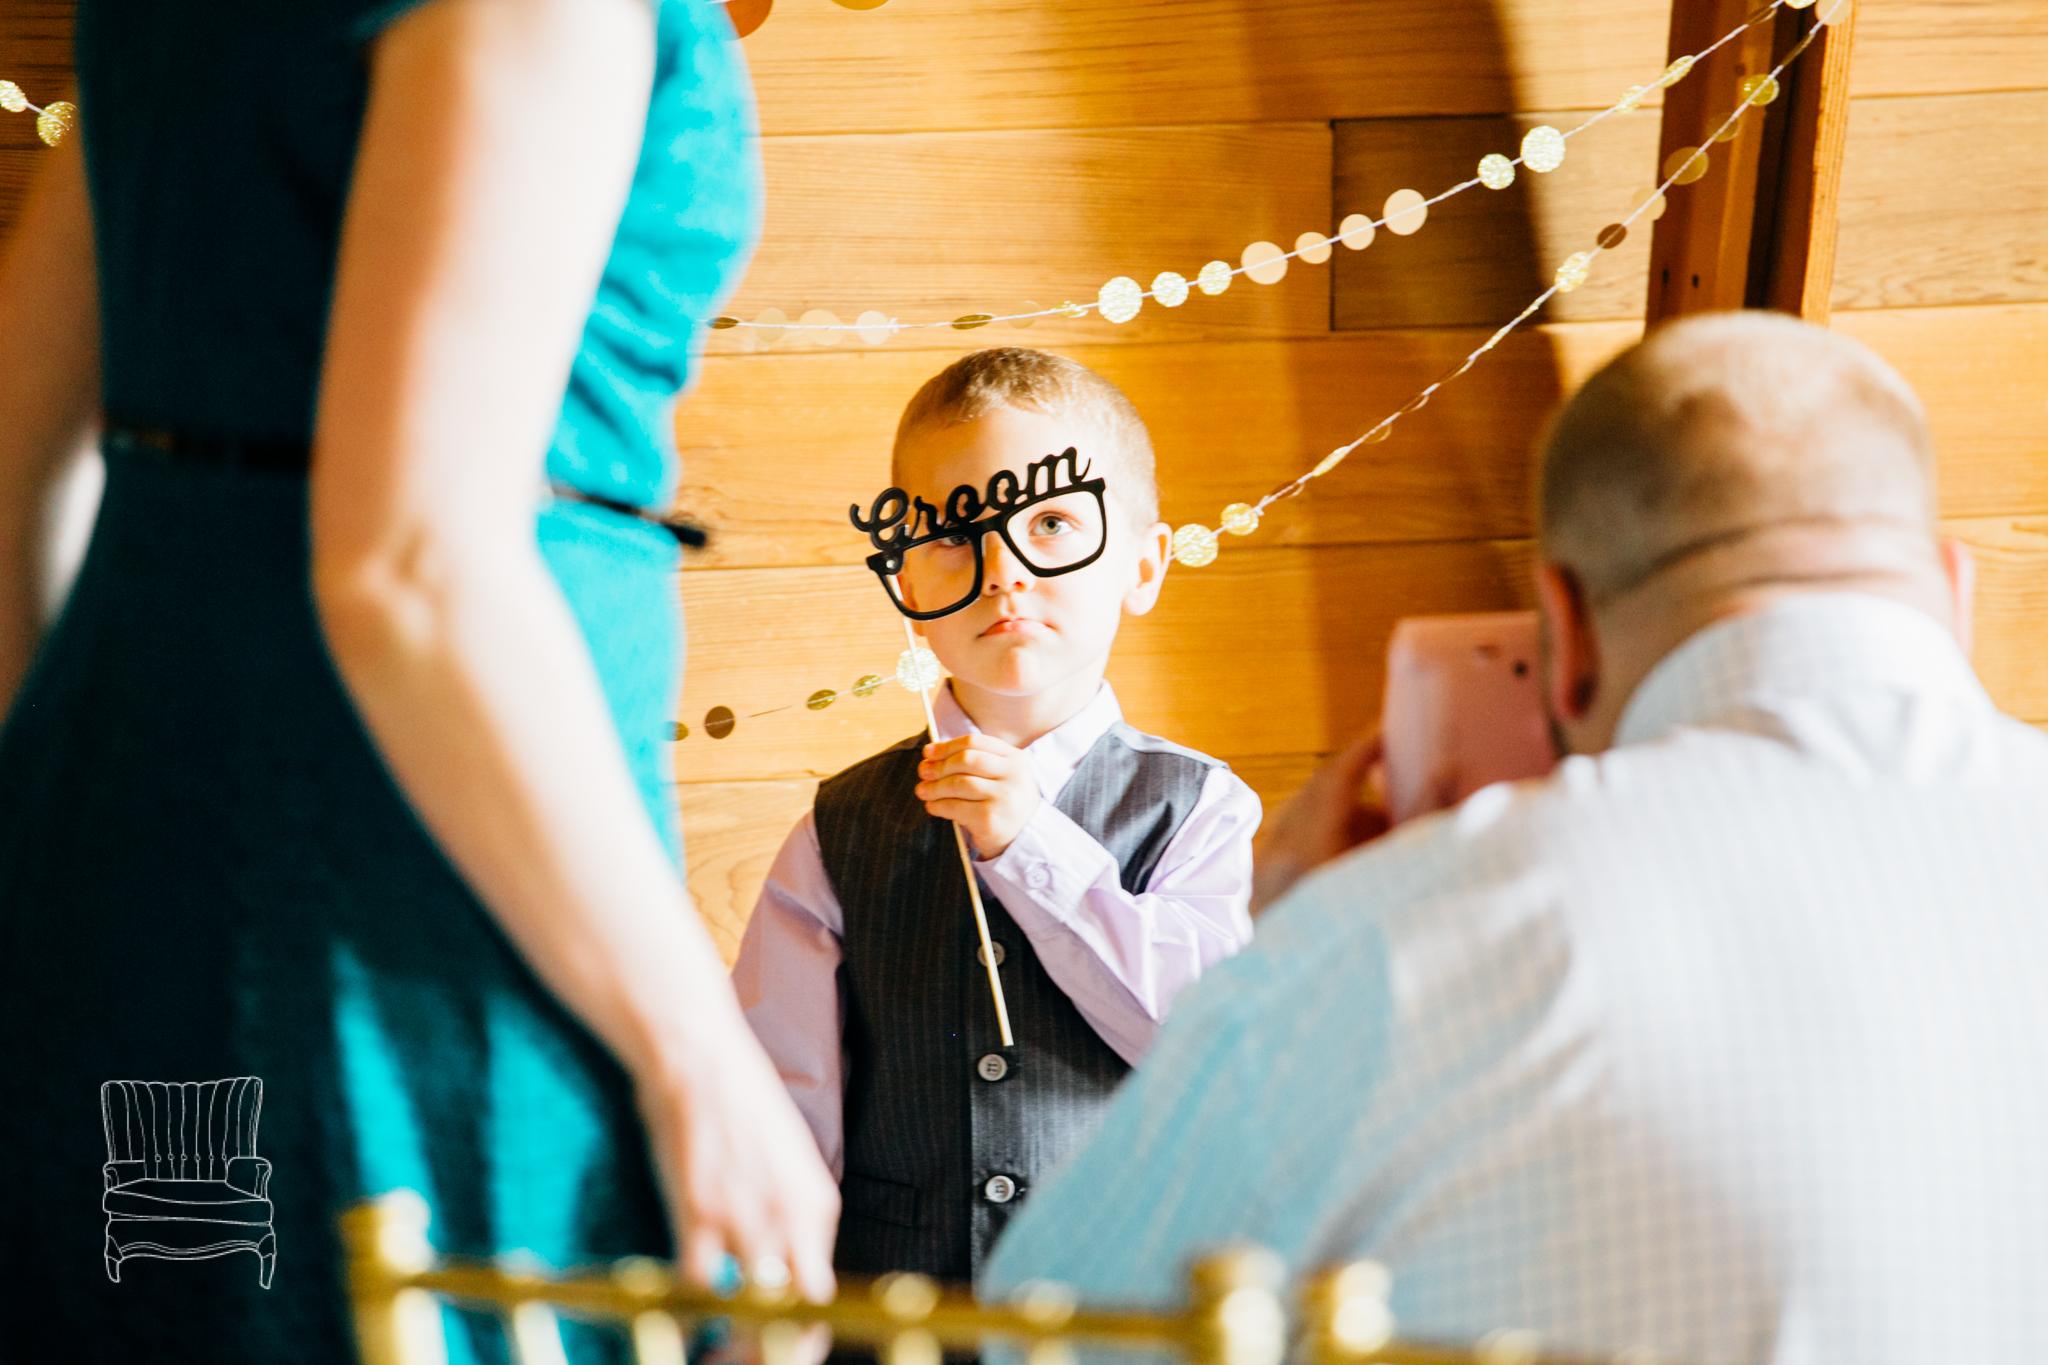 seattle-wedding-photographer-katheryn-moran-russells-bothell-wilkins-wedding-photo-49.jpg